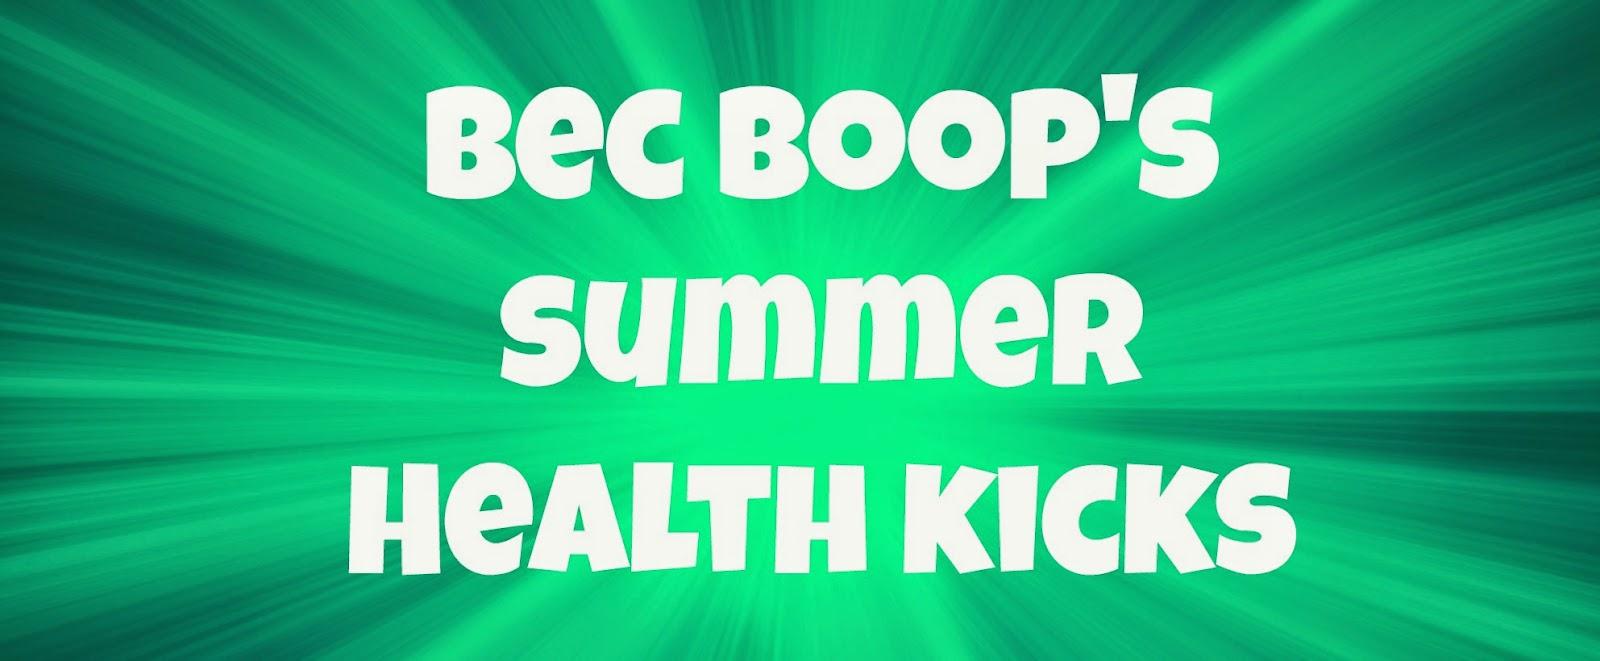 Bec Boop's Summer Health Kicks